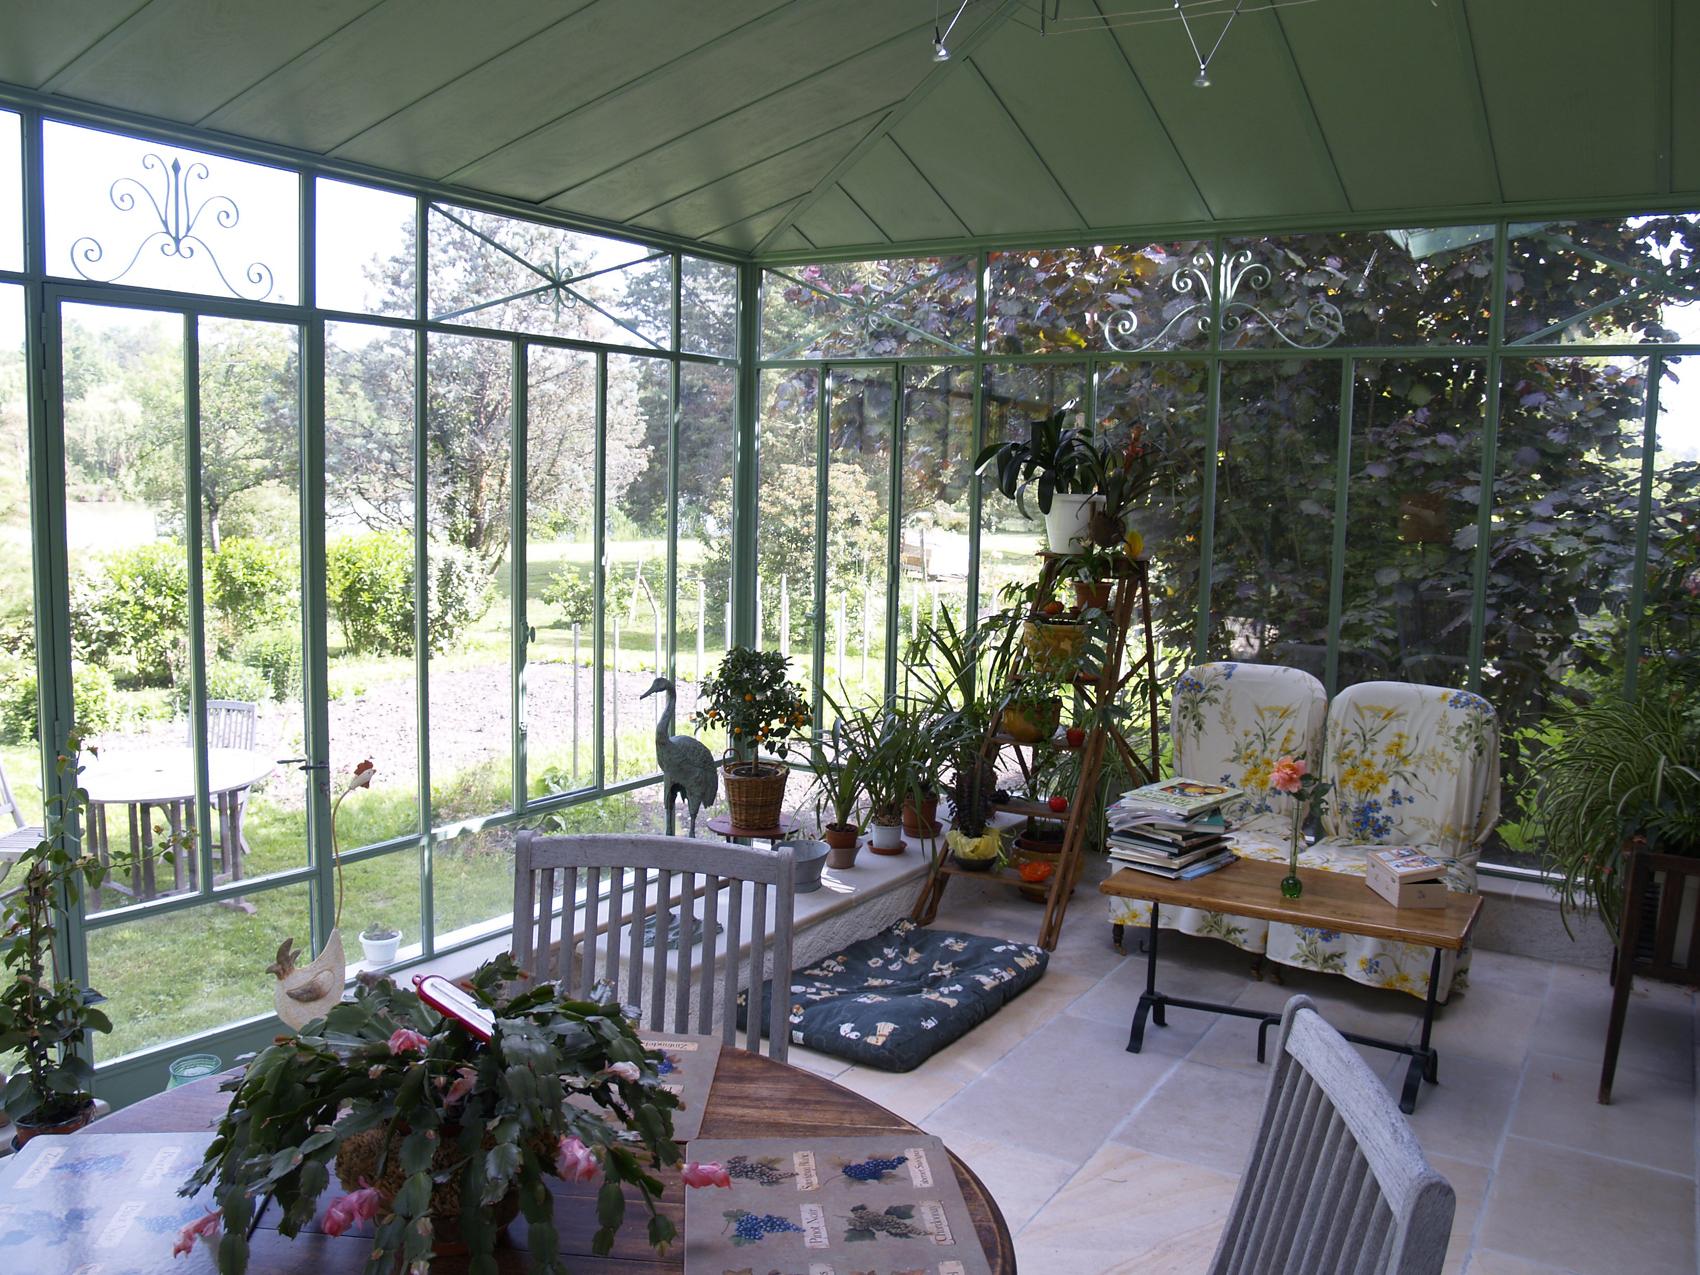 Interieur veranda veranda with interieur veranda cool for Interieur veranda